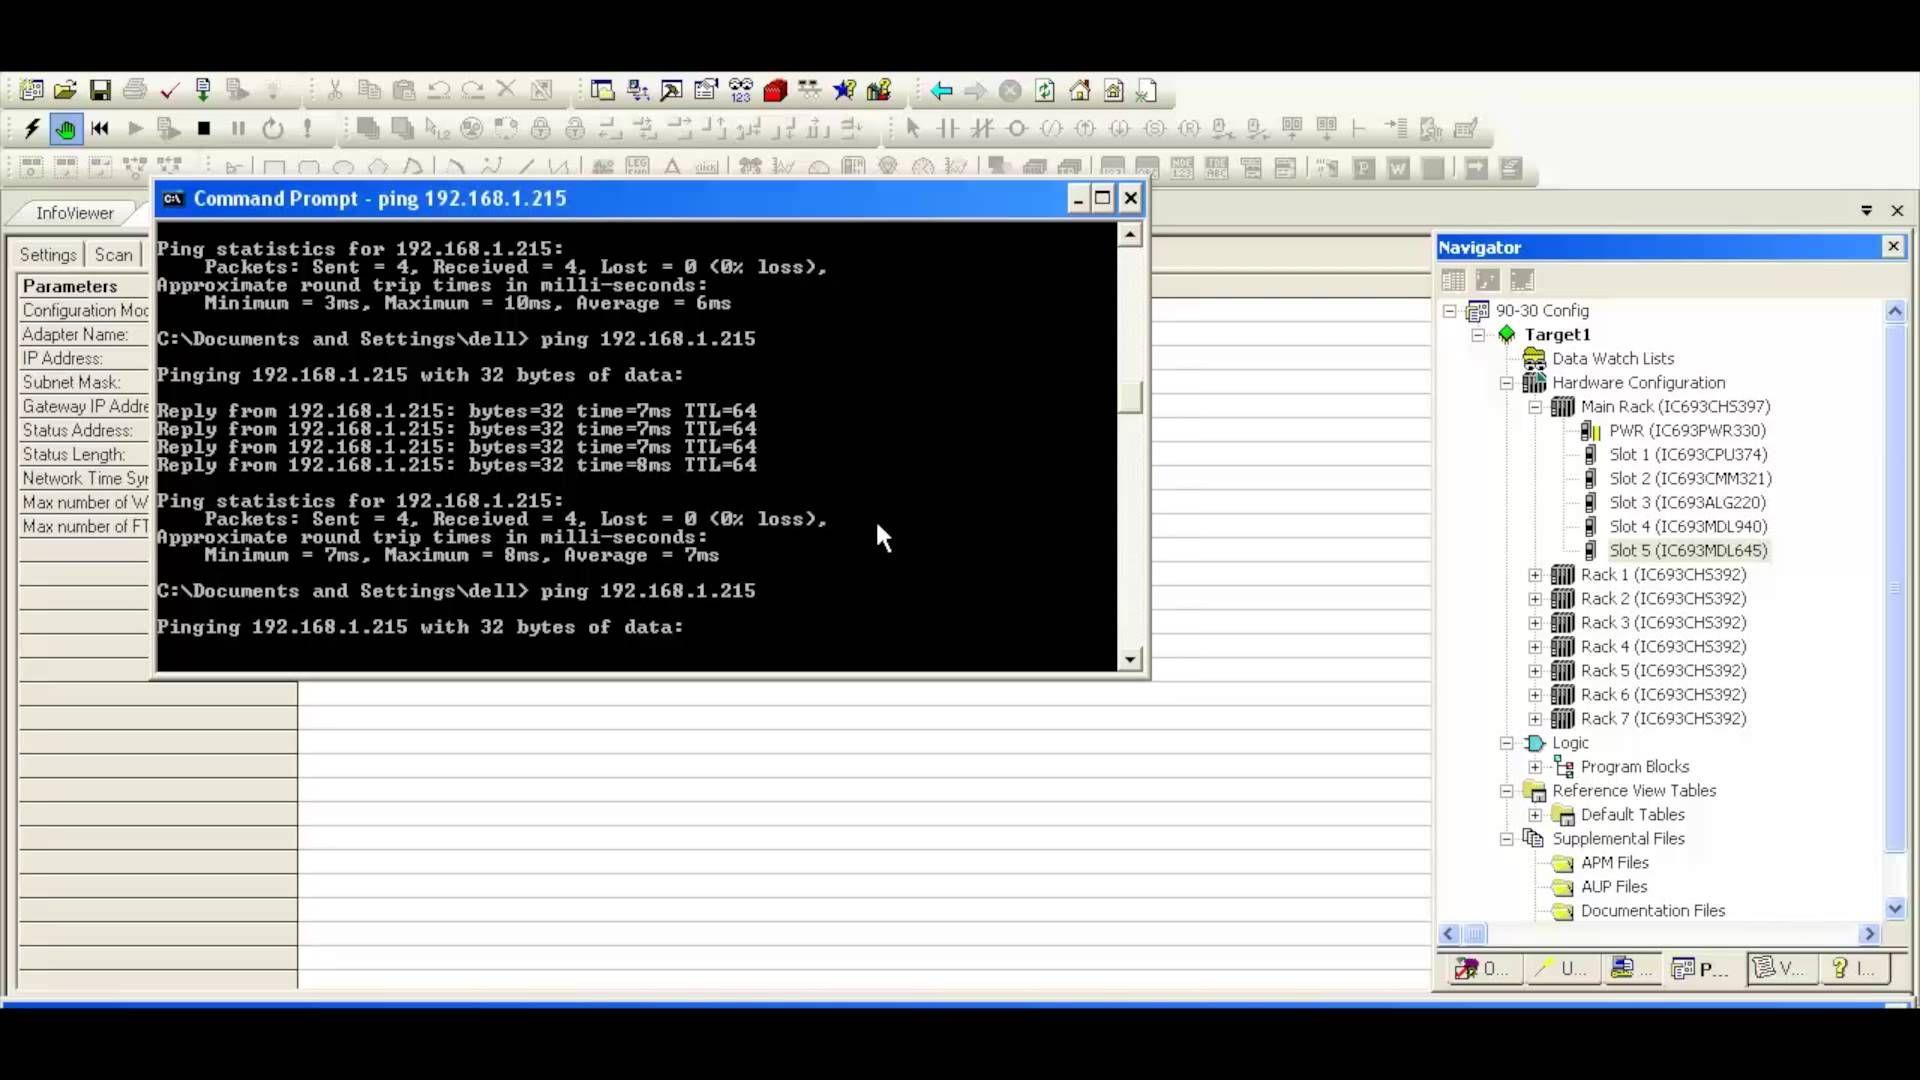 How-to Program GE Fanuc 90-30 PLC System using Proficy Machine